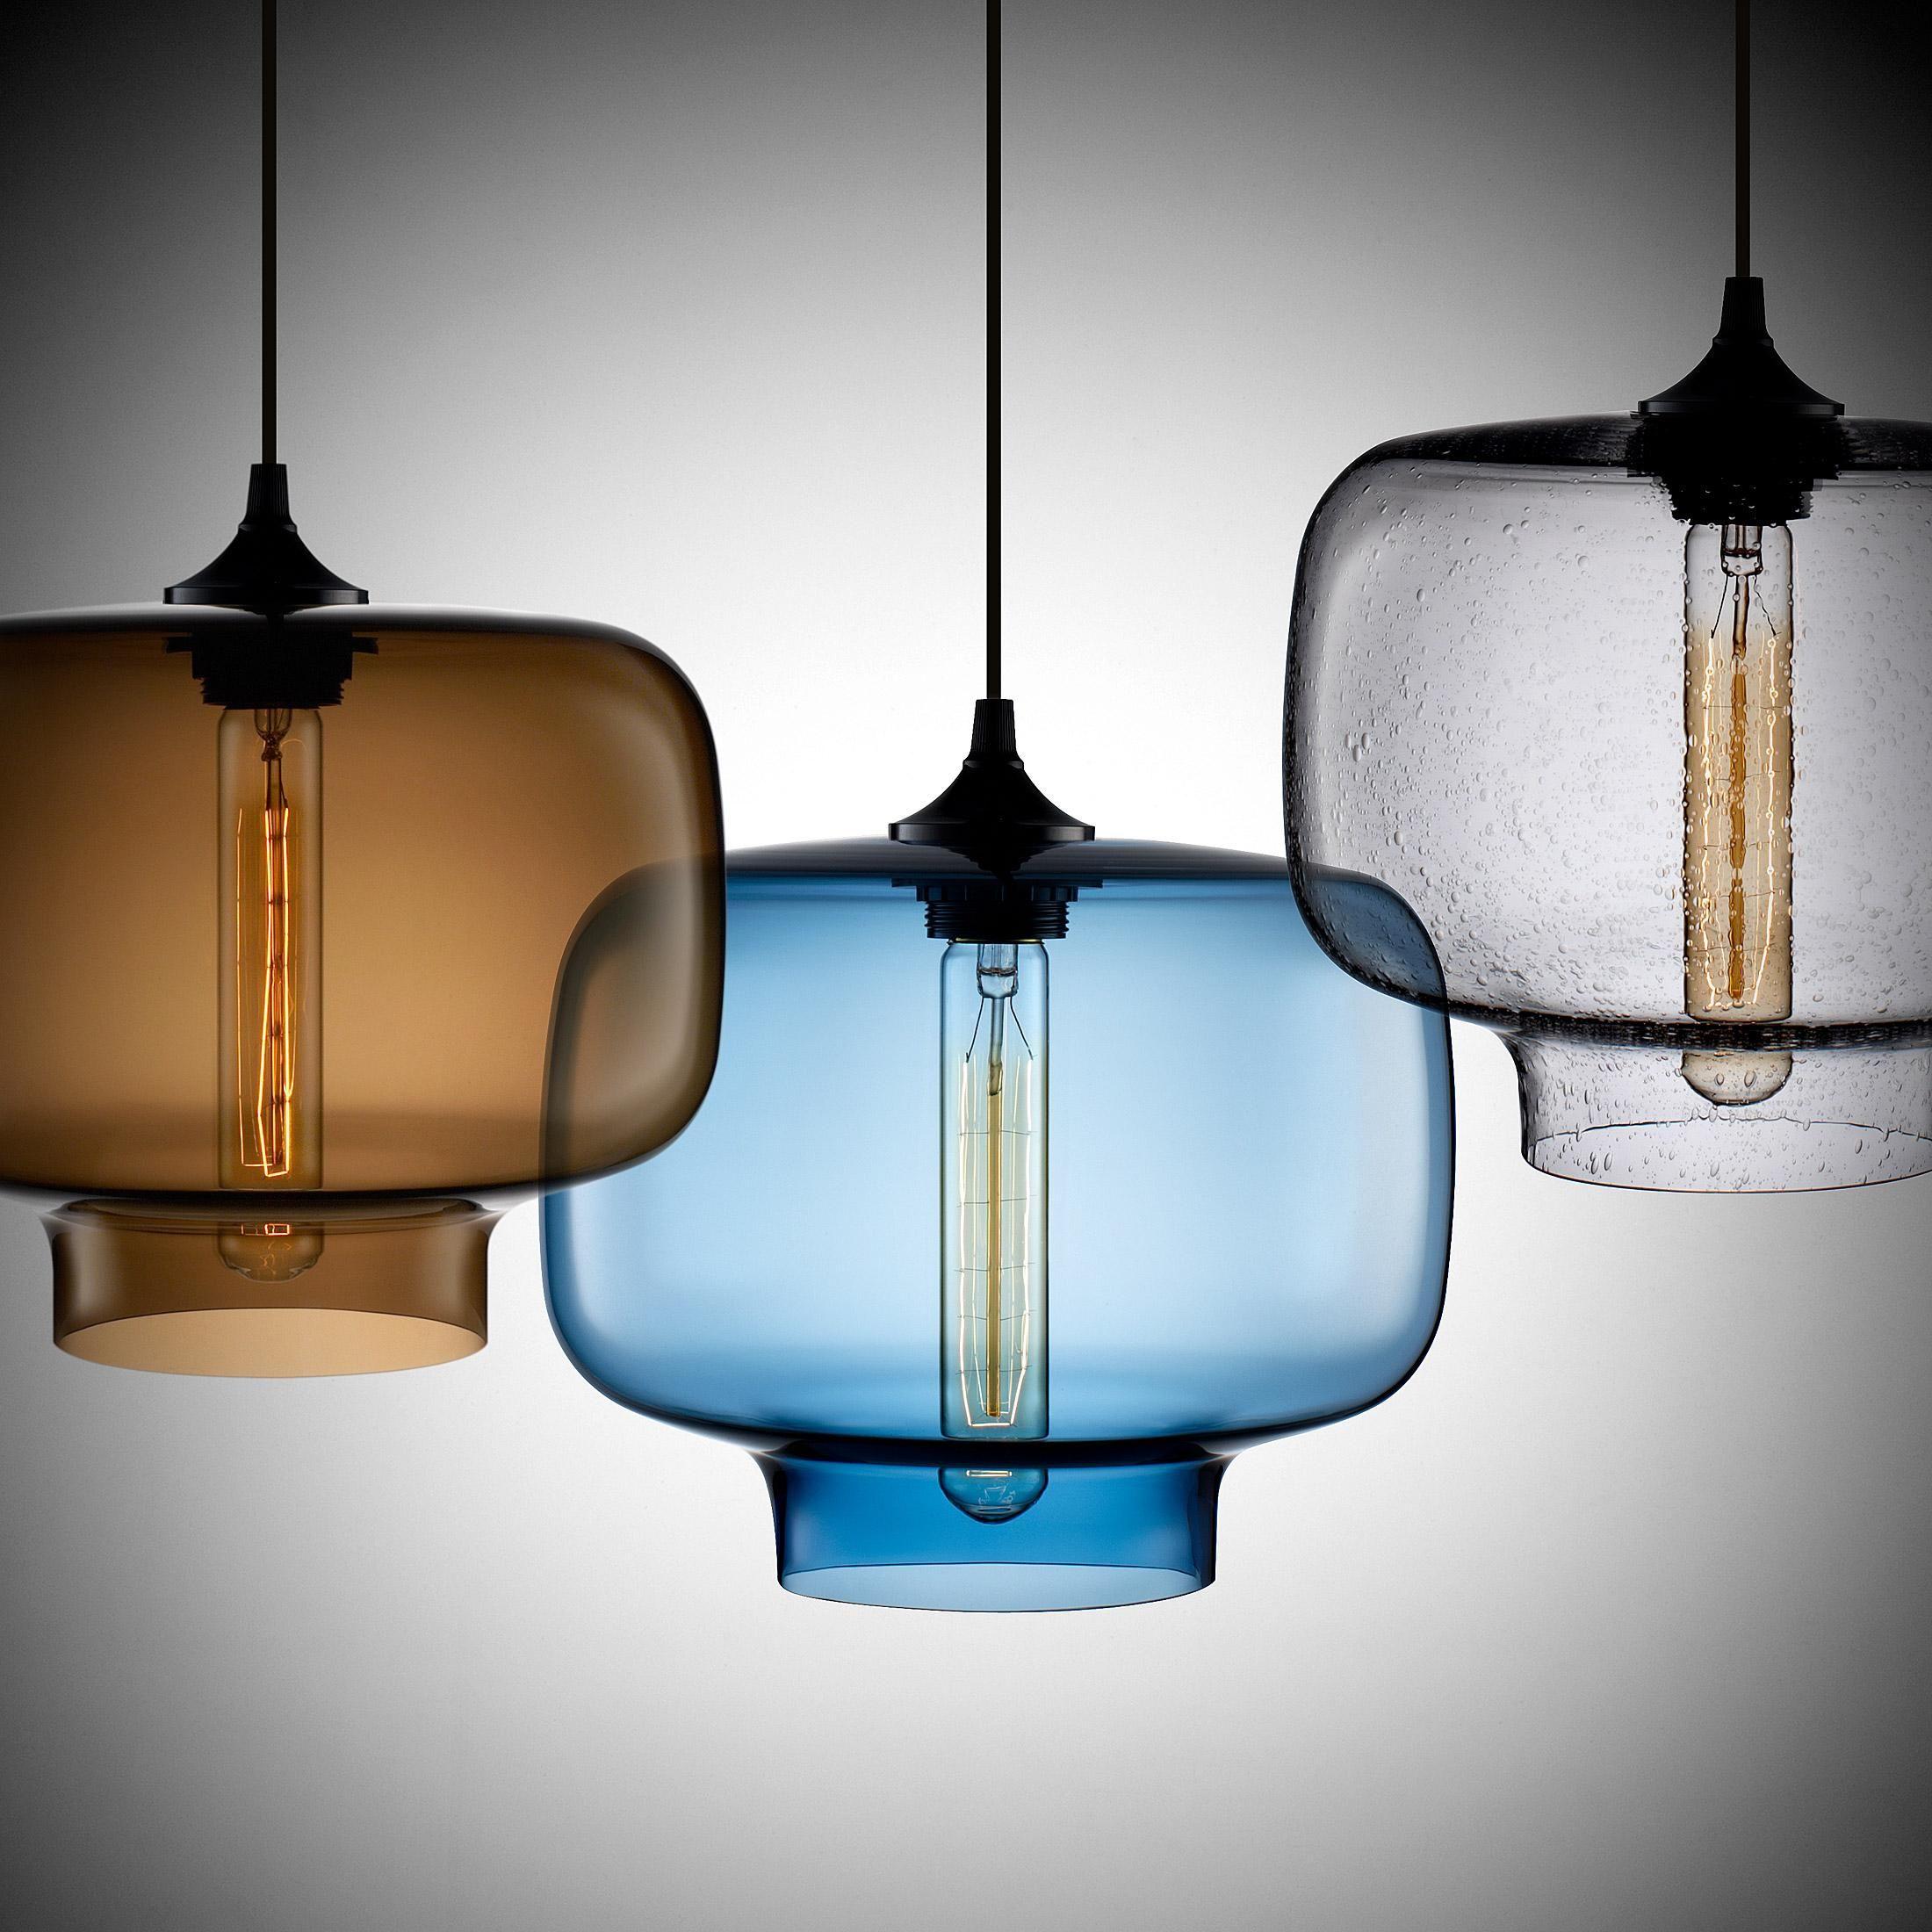 Amazing glass pendant lights perfect design with modern glass amazing glass pendant lights perfect design with modern glass pendant lights jpg 2 pixels on wookmark aloadofball Images